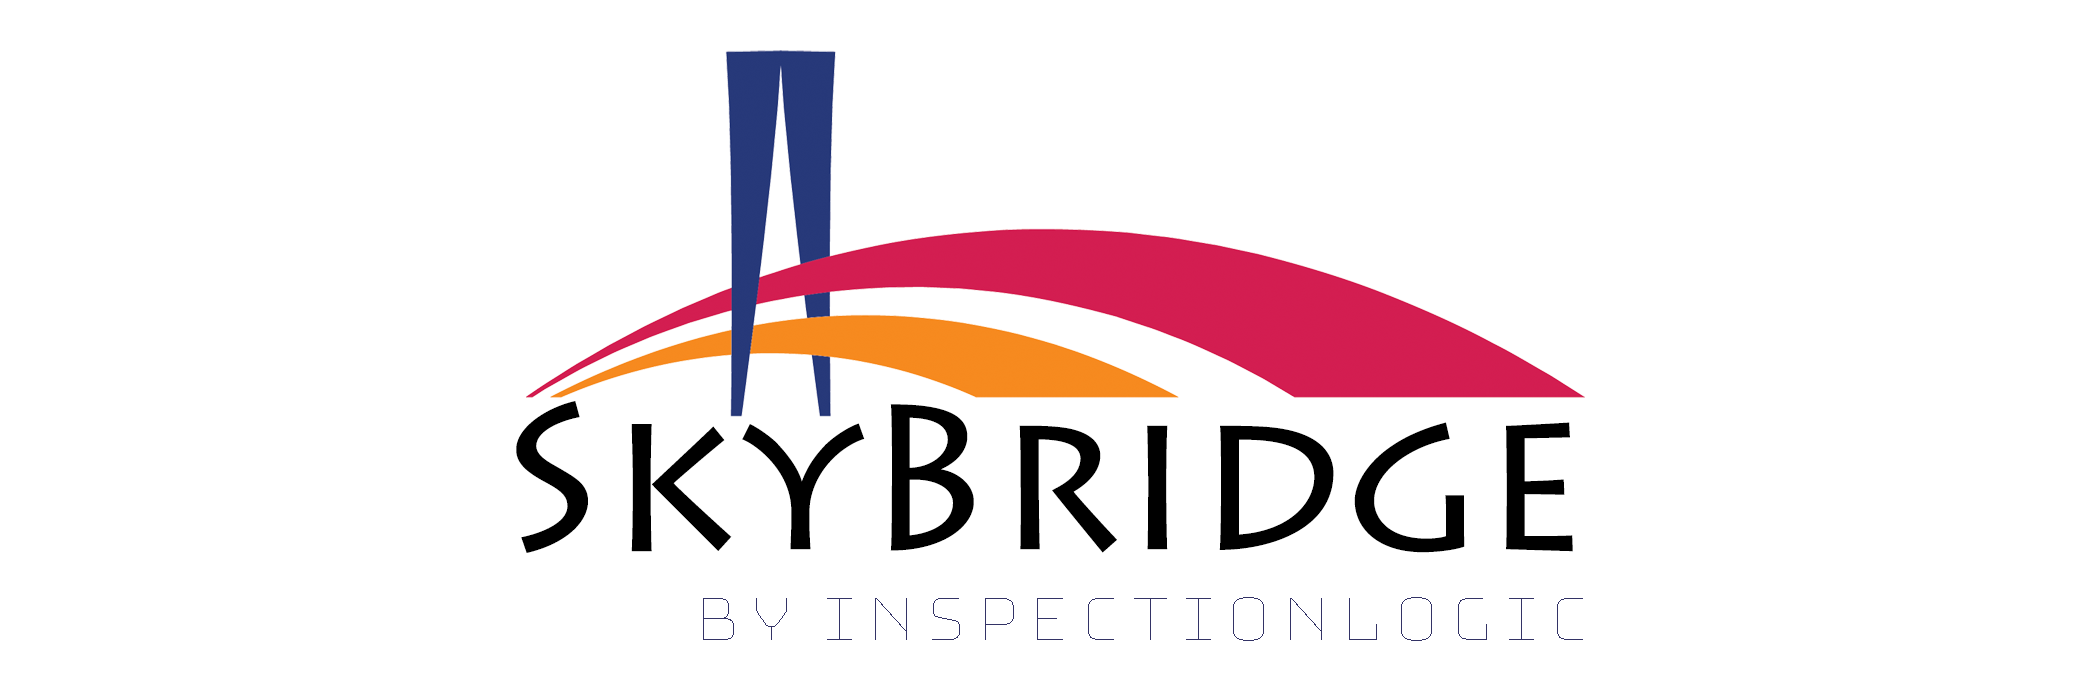 SkyBridge.png